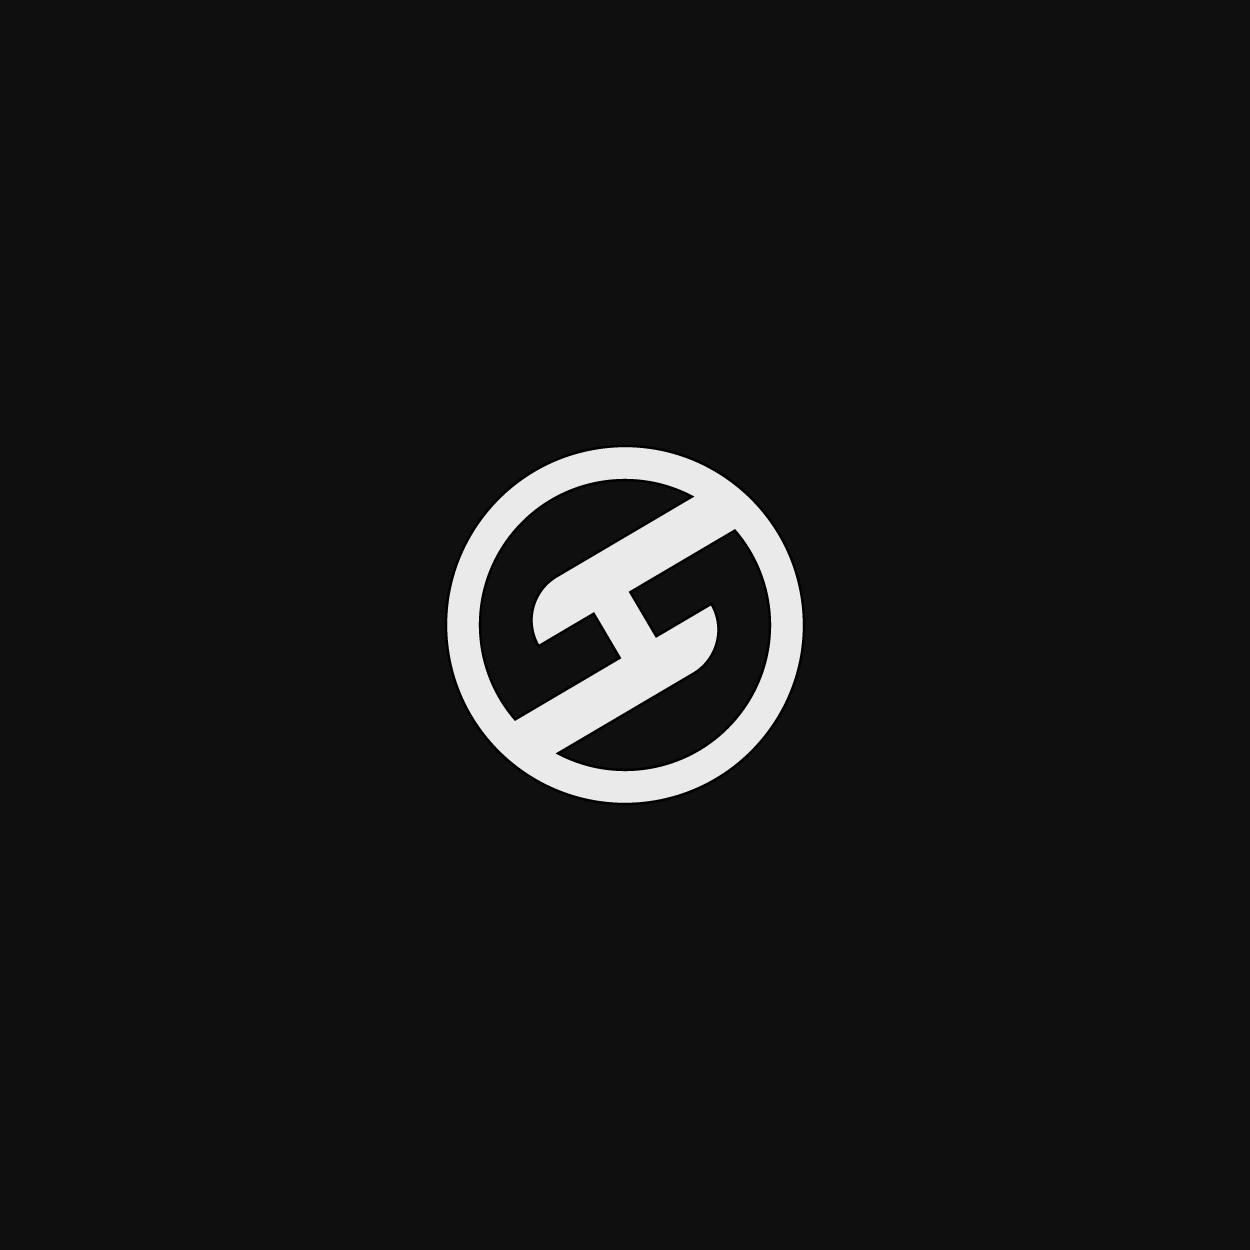 Sylvan_Logofolio2019_Artboard 112 copy1250.jpg